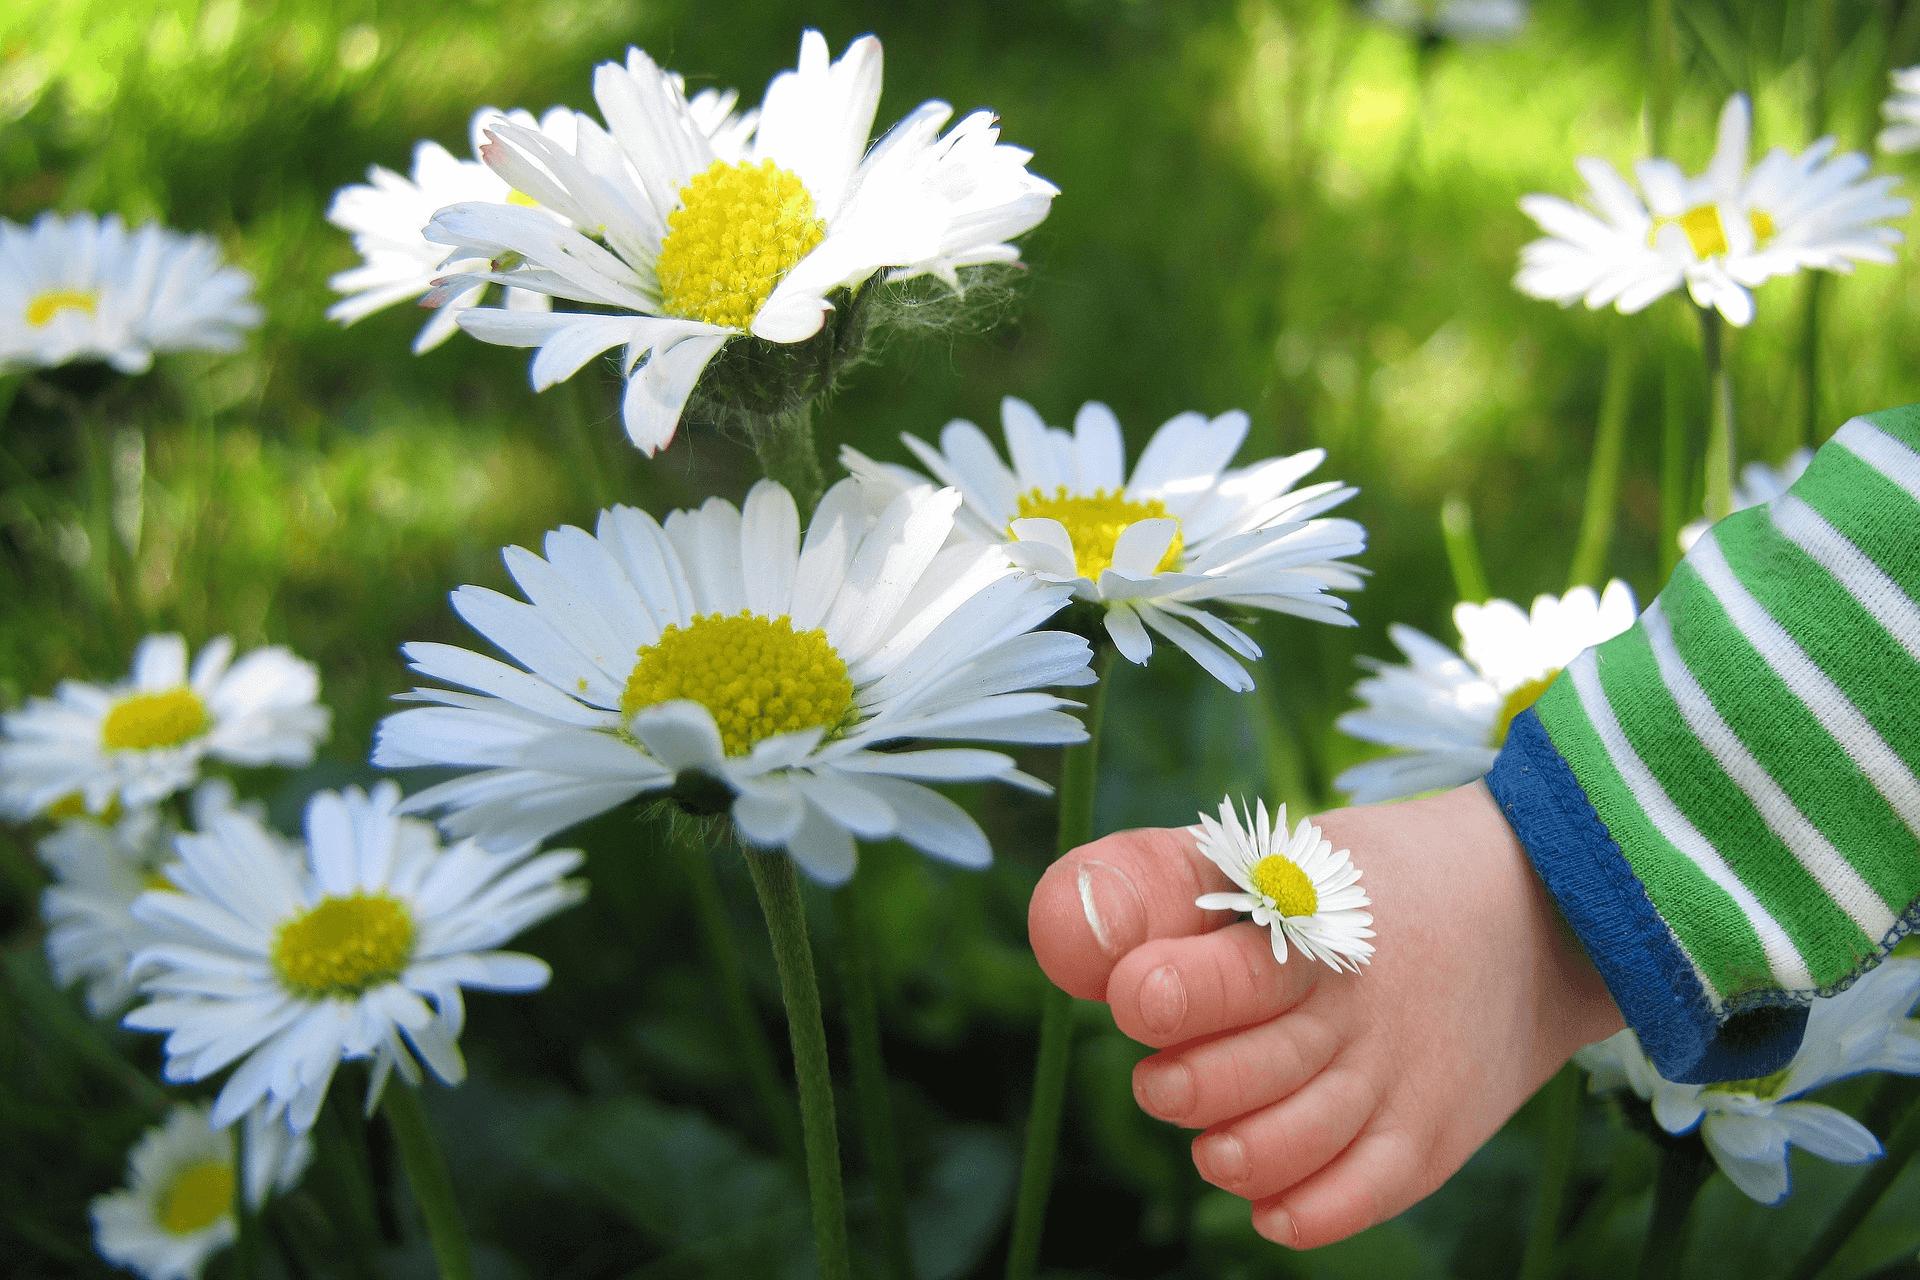 Oldiefan – Gänseblümchen – pixabay.com